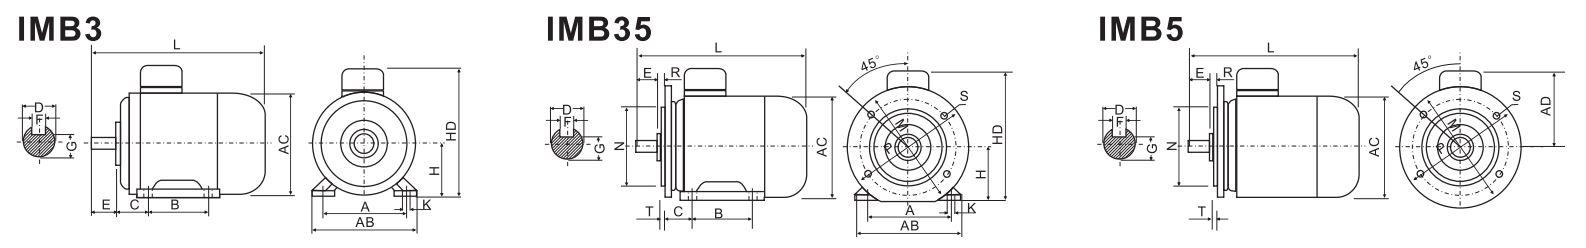 ABLE Y-160M2-2 15,0 кВт чертеж